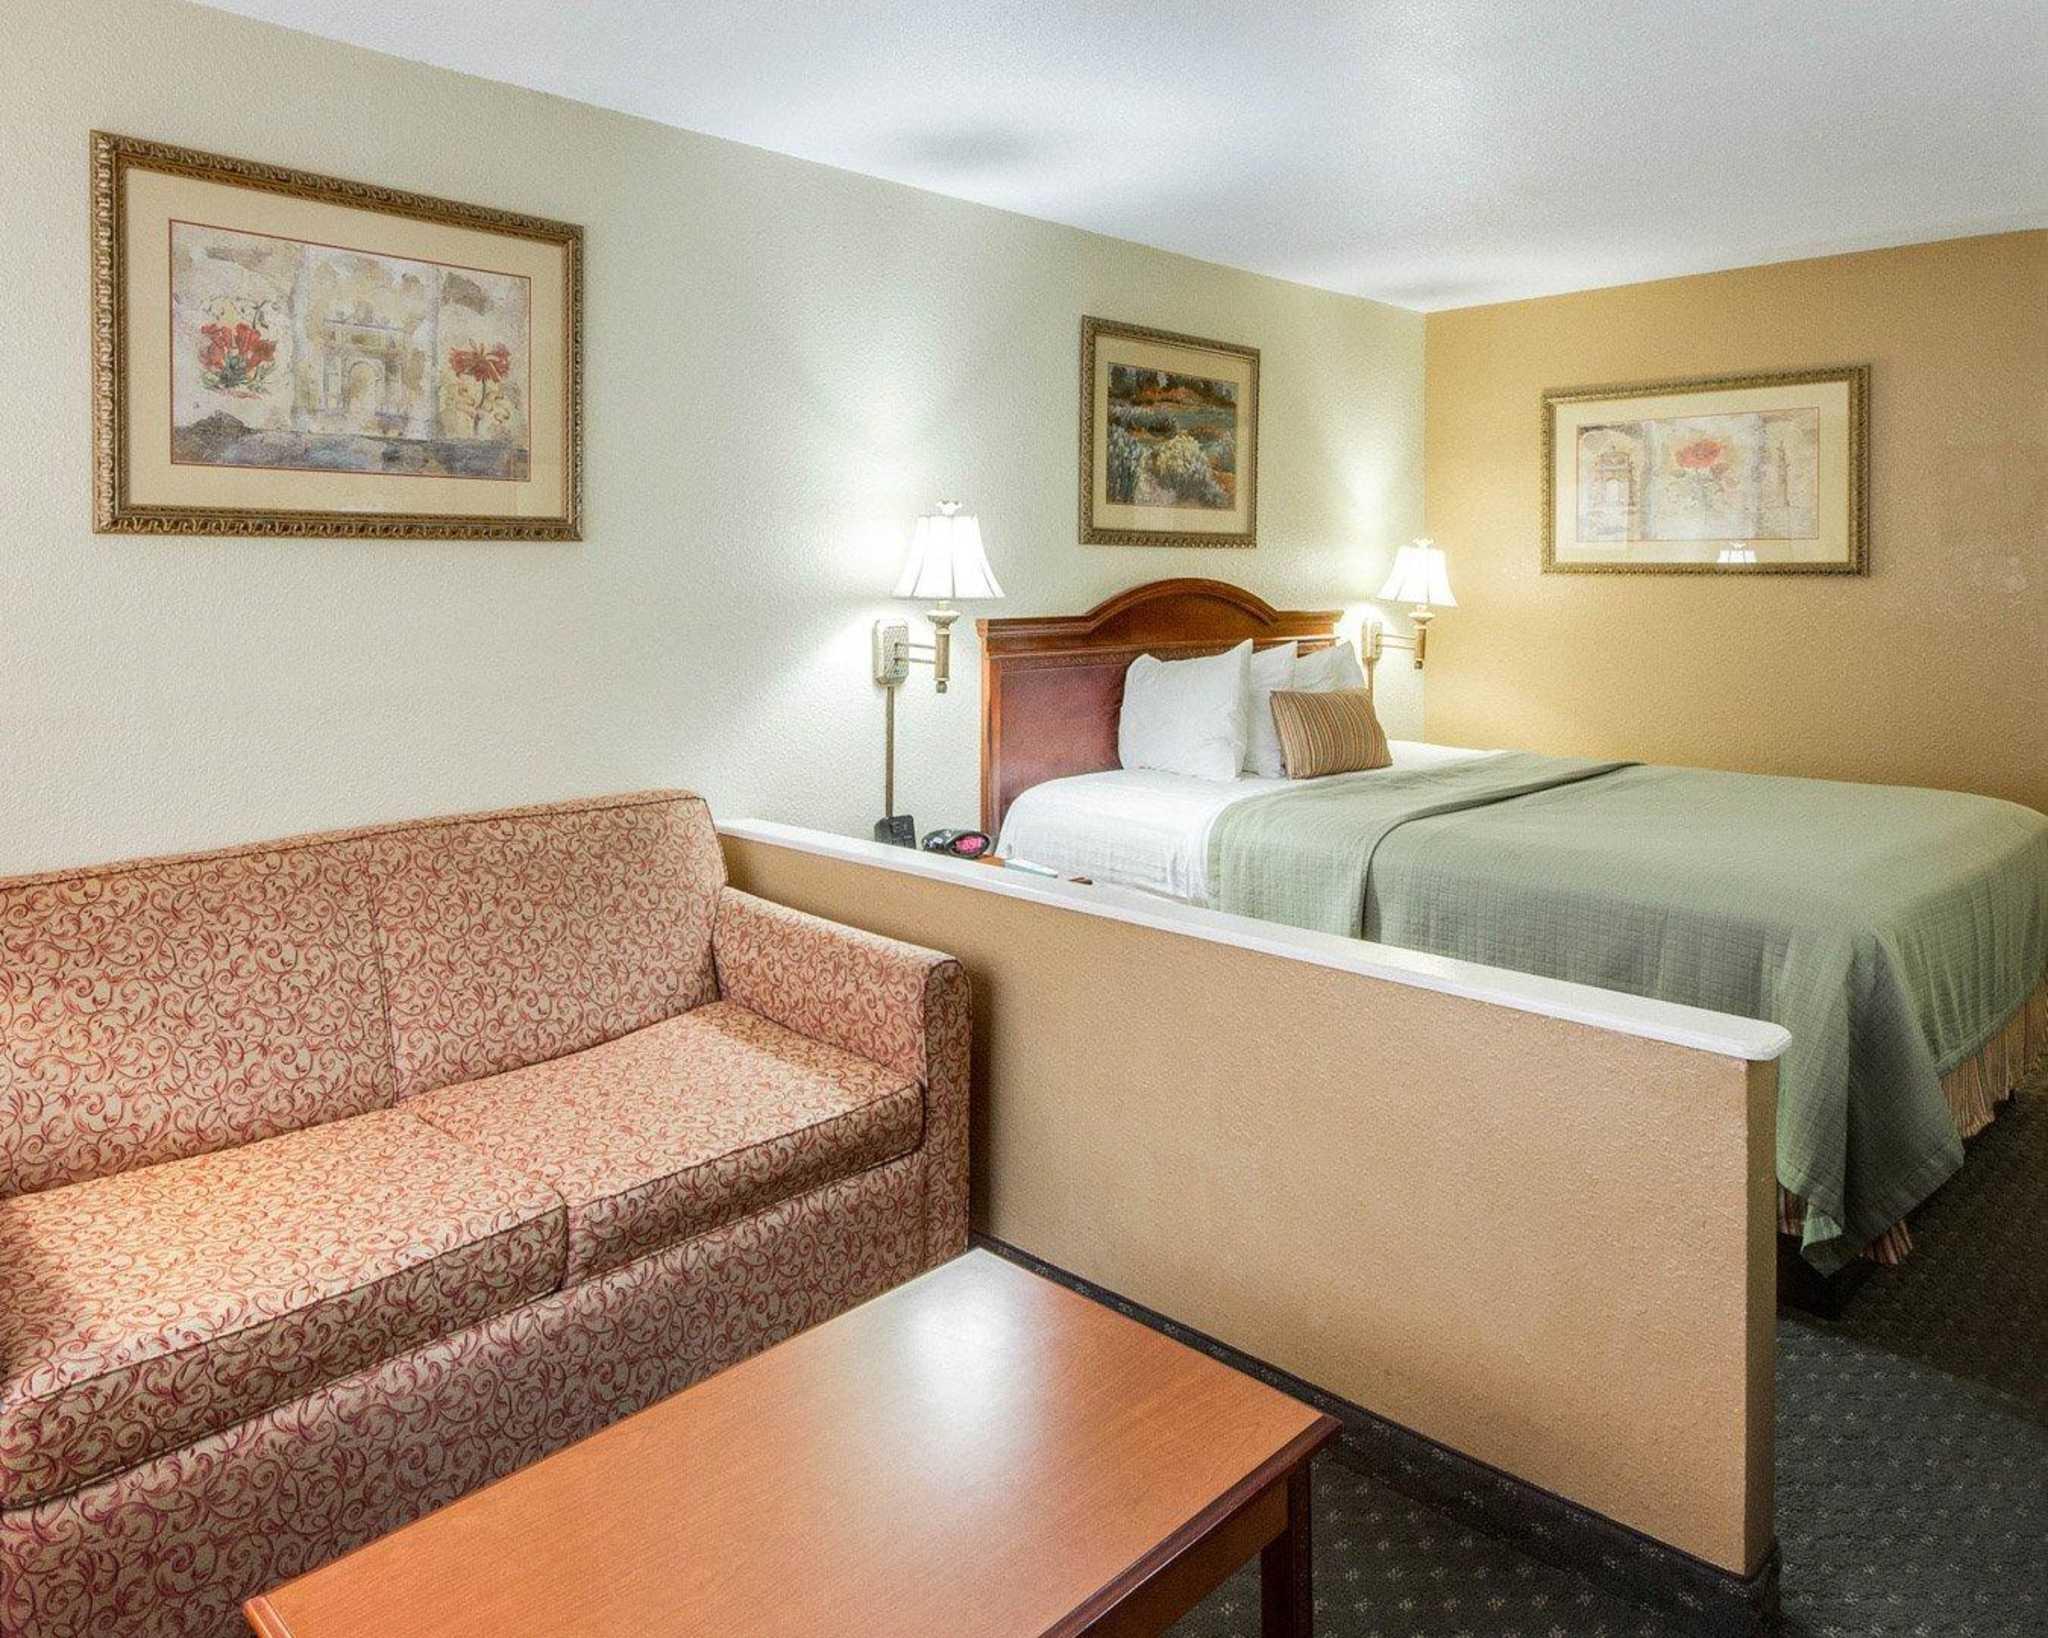 Quality Inn & Suites Eagle Pass image 22